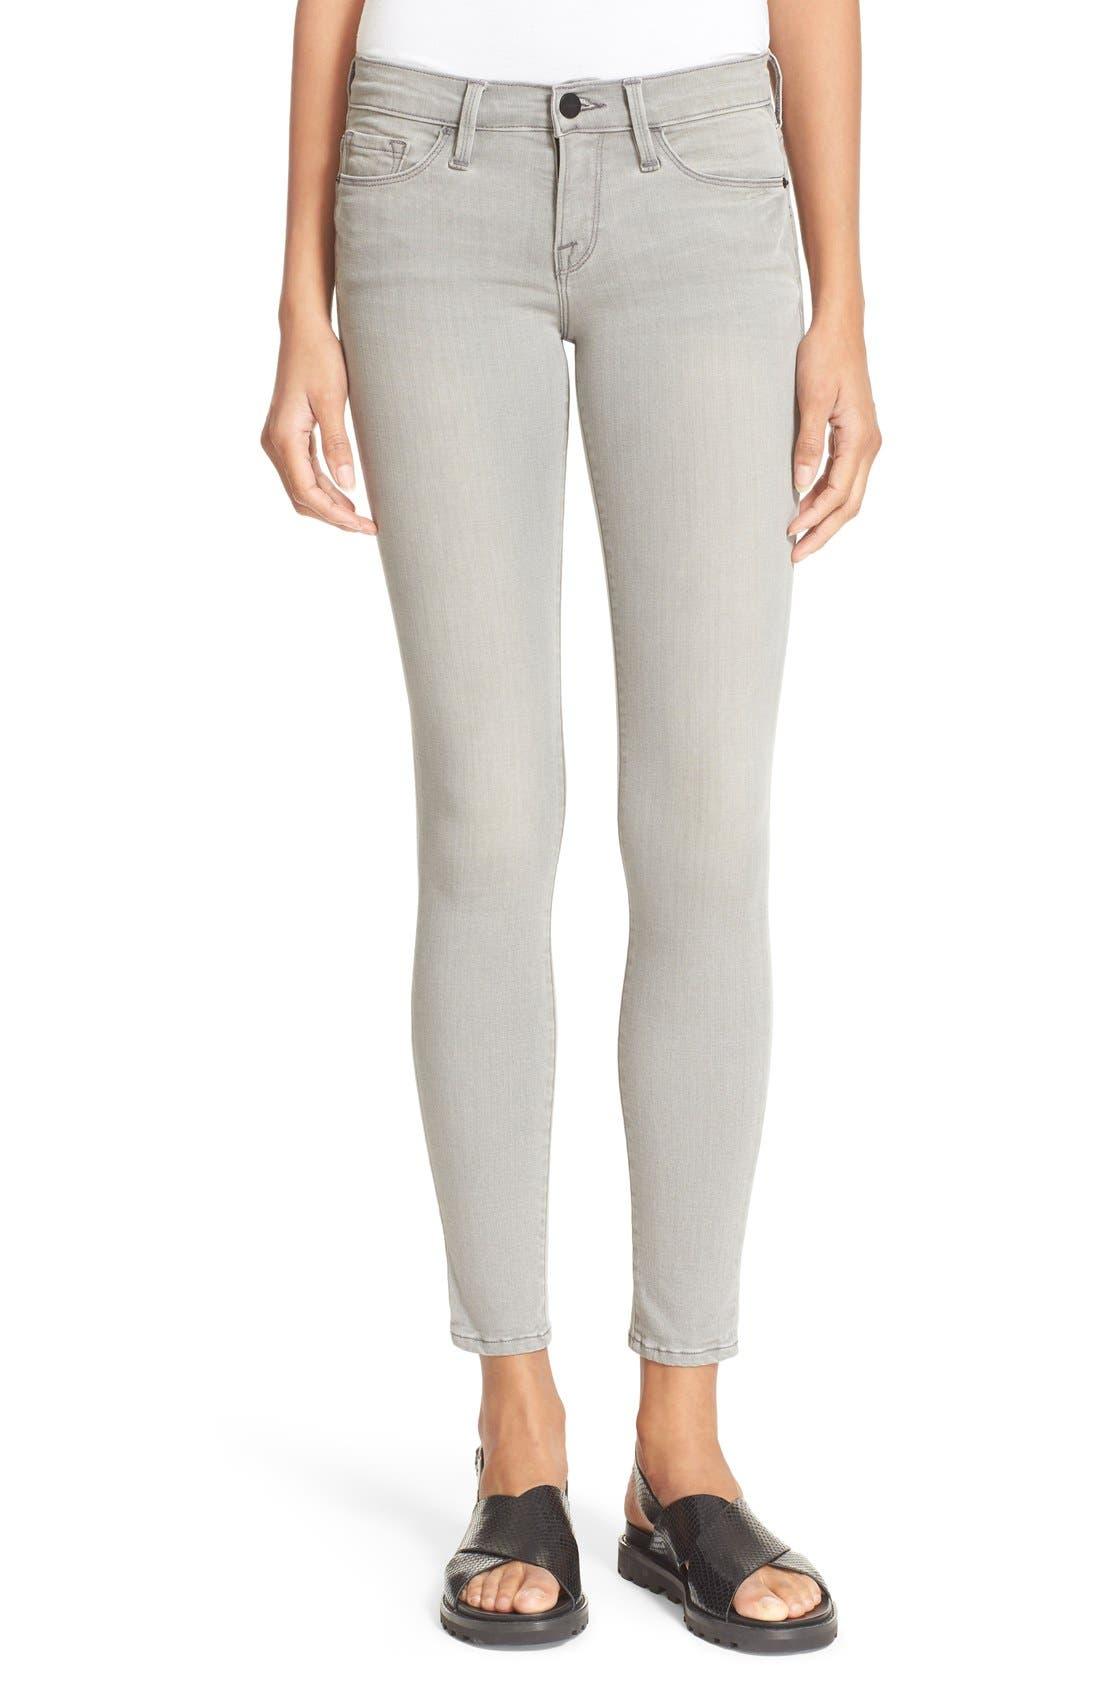 Alternate Image 1 Selected - FRAME 'Le Skinny de Jeanne' Jeans (Wilton)